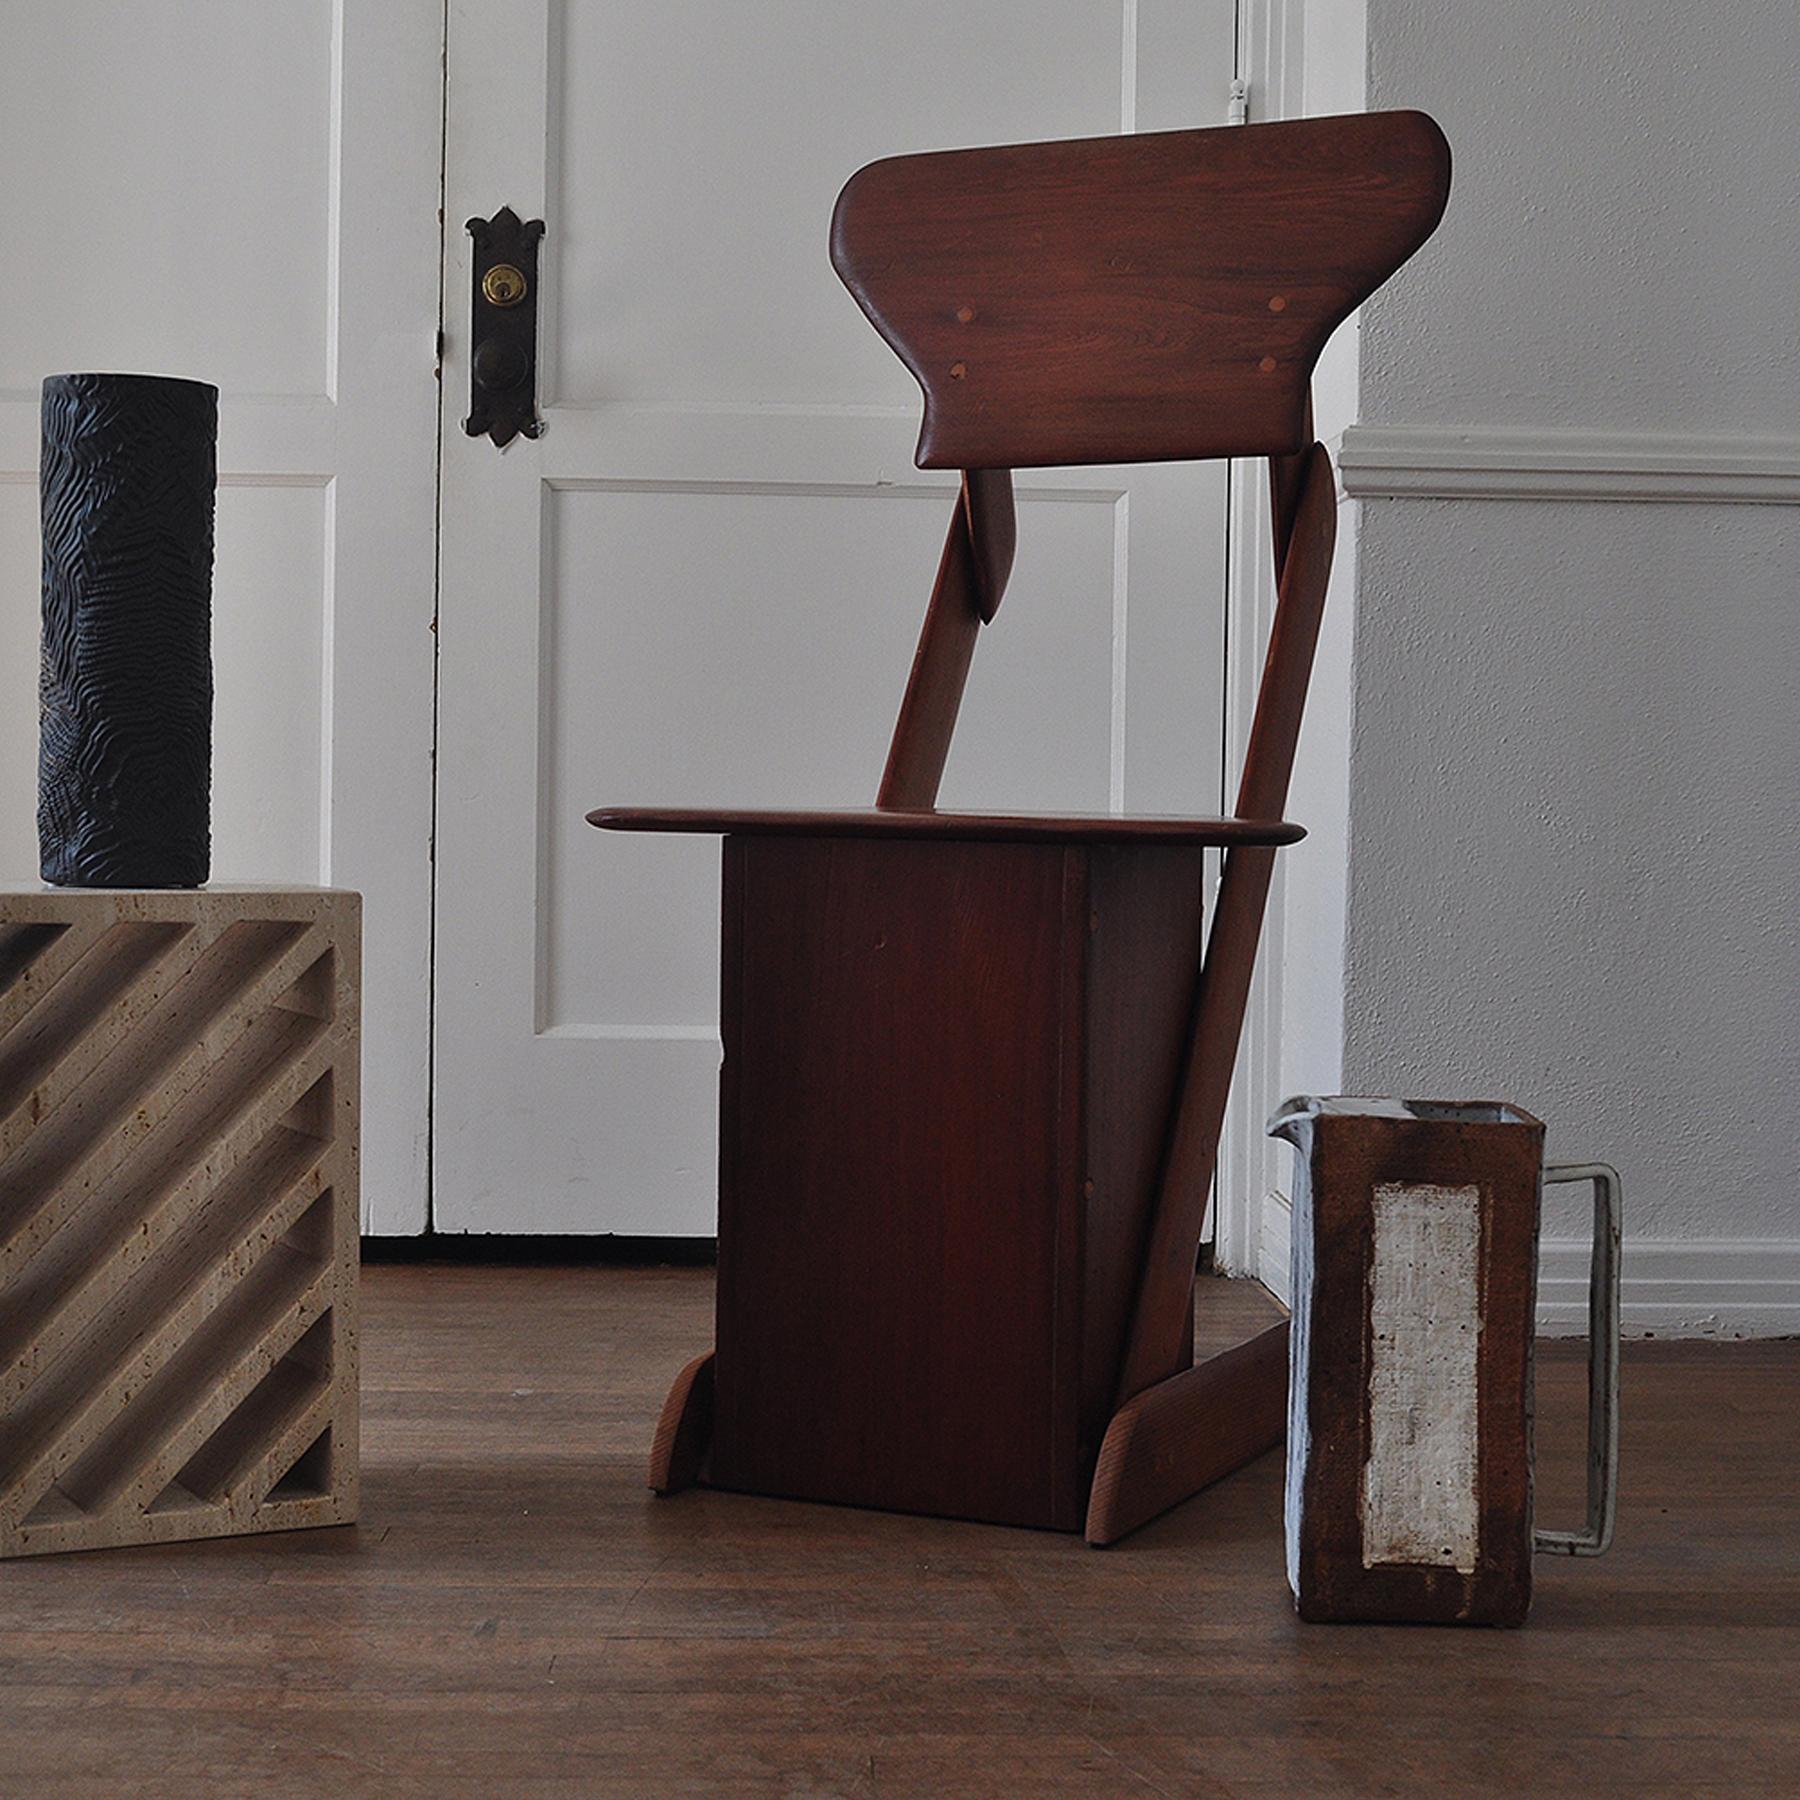 siglo-moderno-brand-history-sculpting-60.jpg